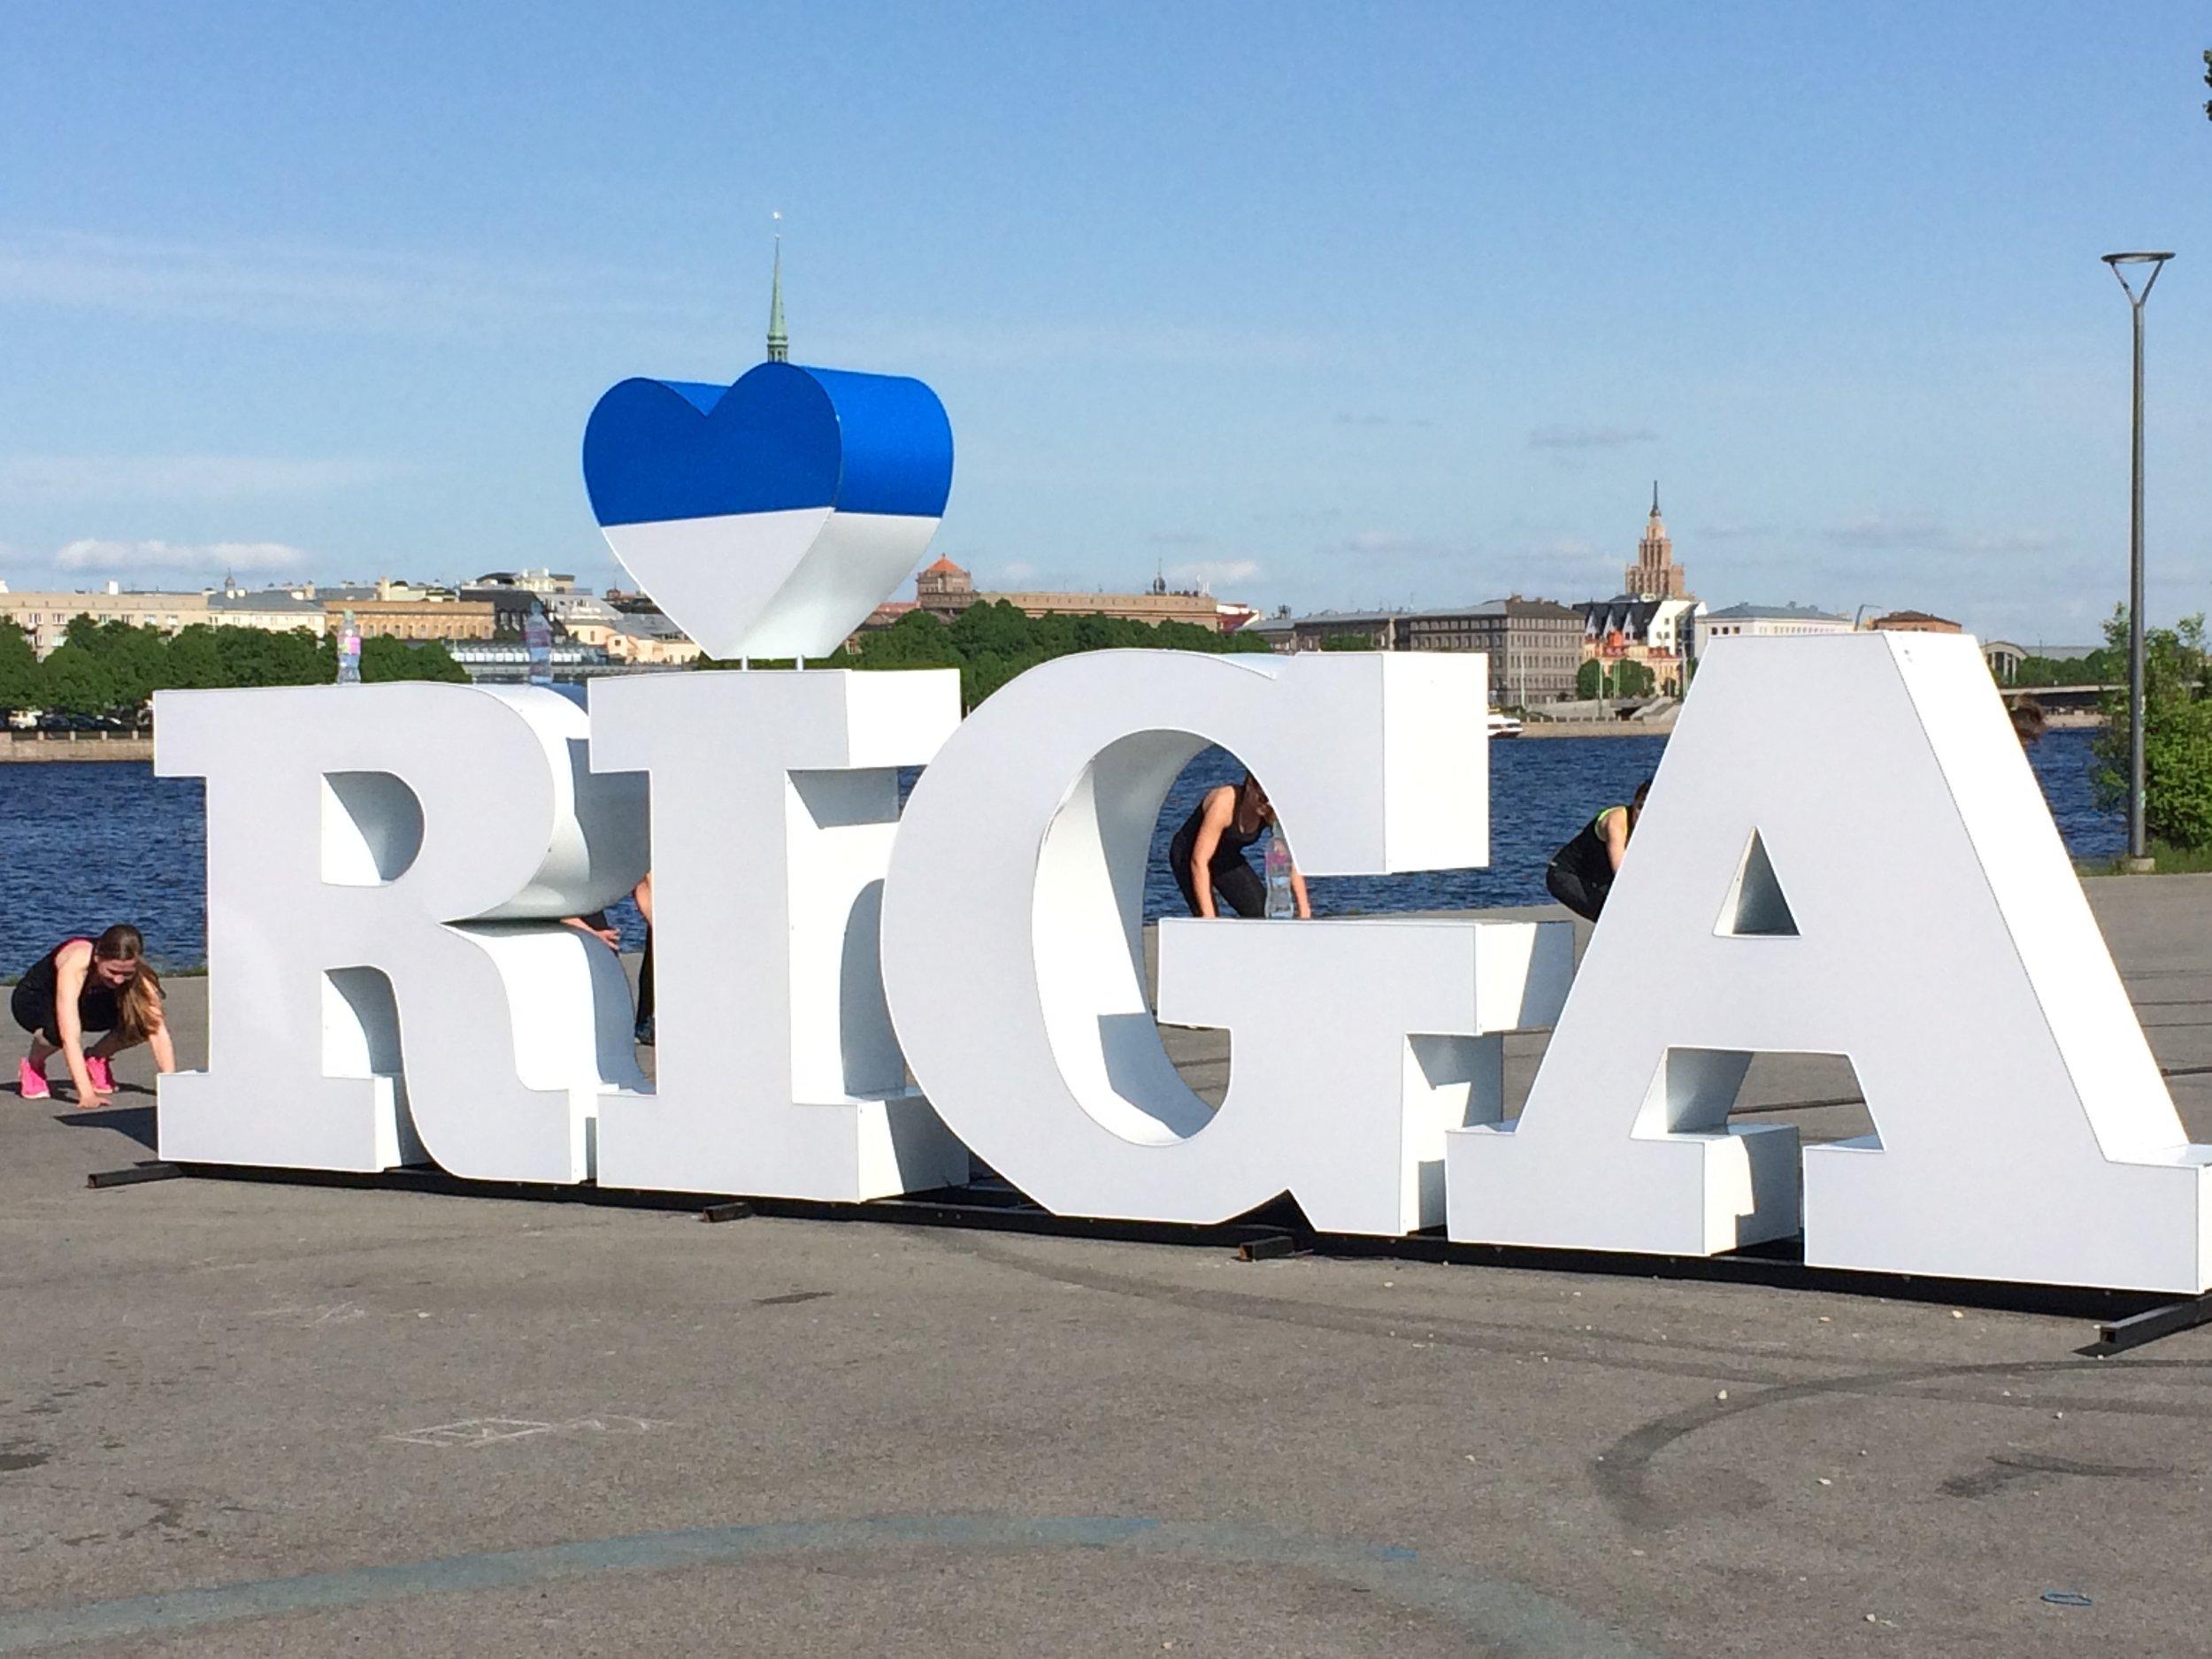 Crossfire enthusiasts heart Riga